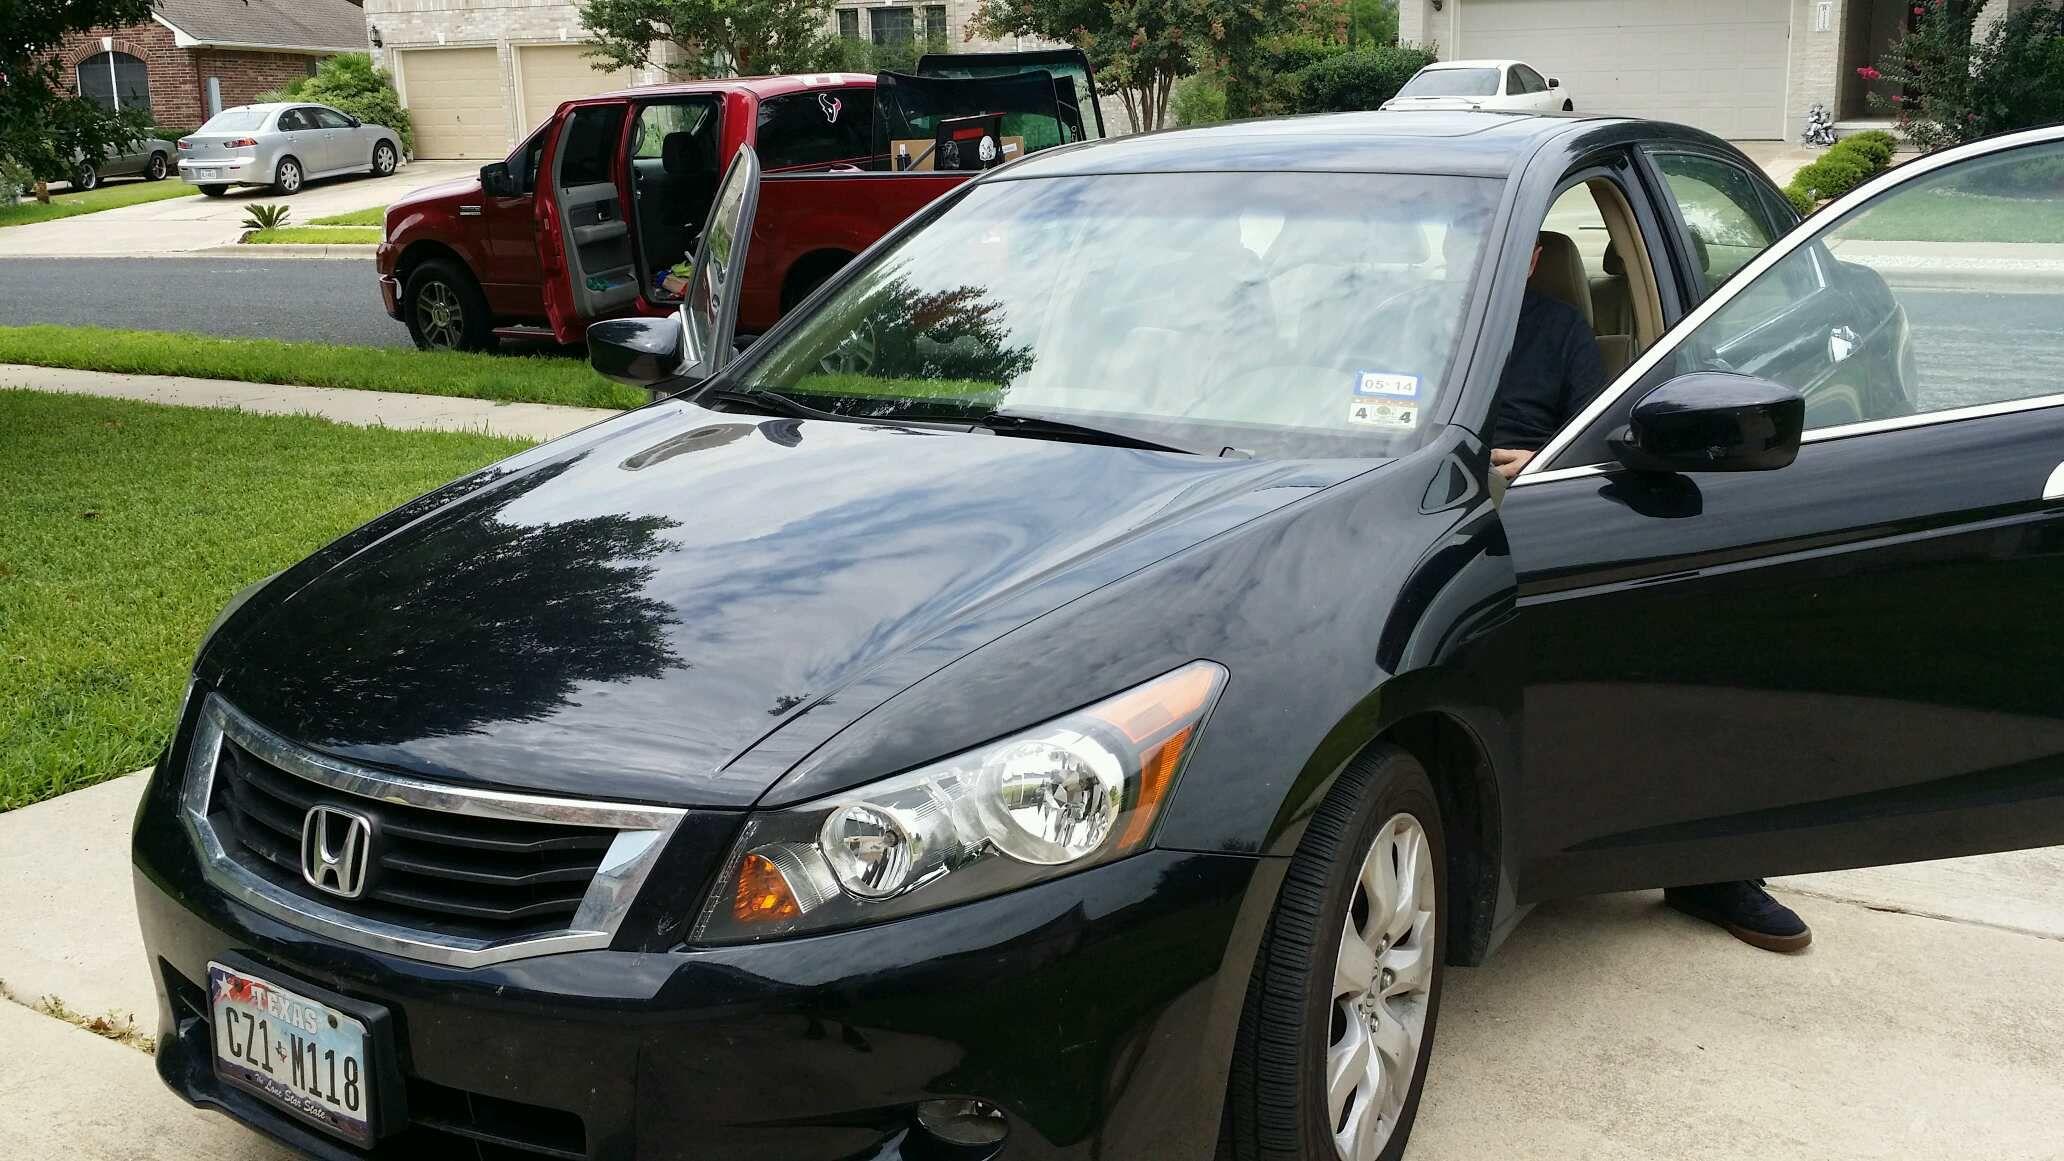 2008 honda accord 4 door sedan windshield. Black Bedroom Furniture Sets. Home Design Ideas